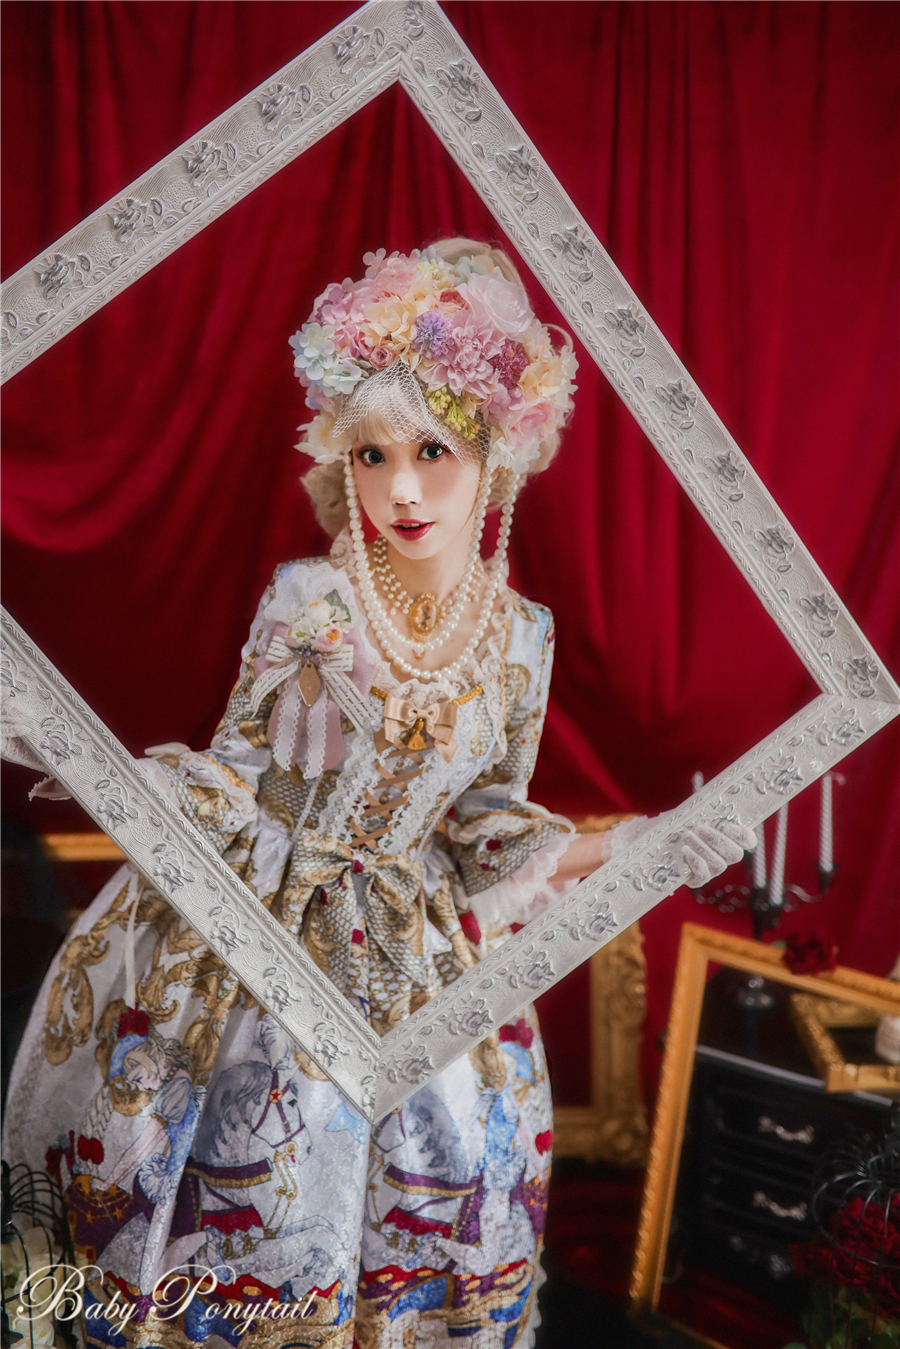 Baby Ponytail_Circus Princess_Silver OP_Kaka_17.jpg